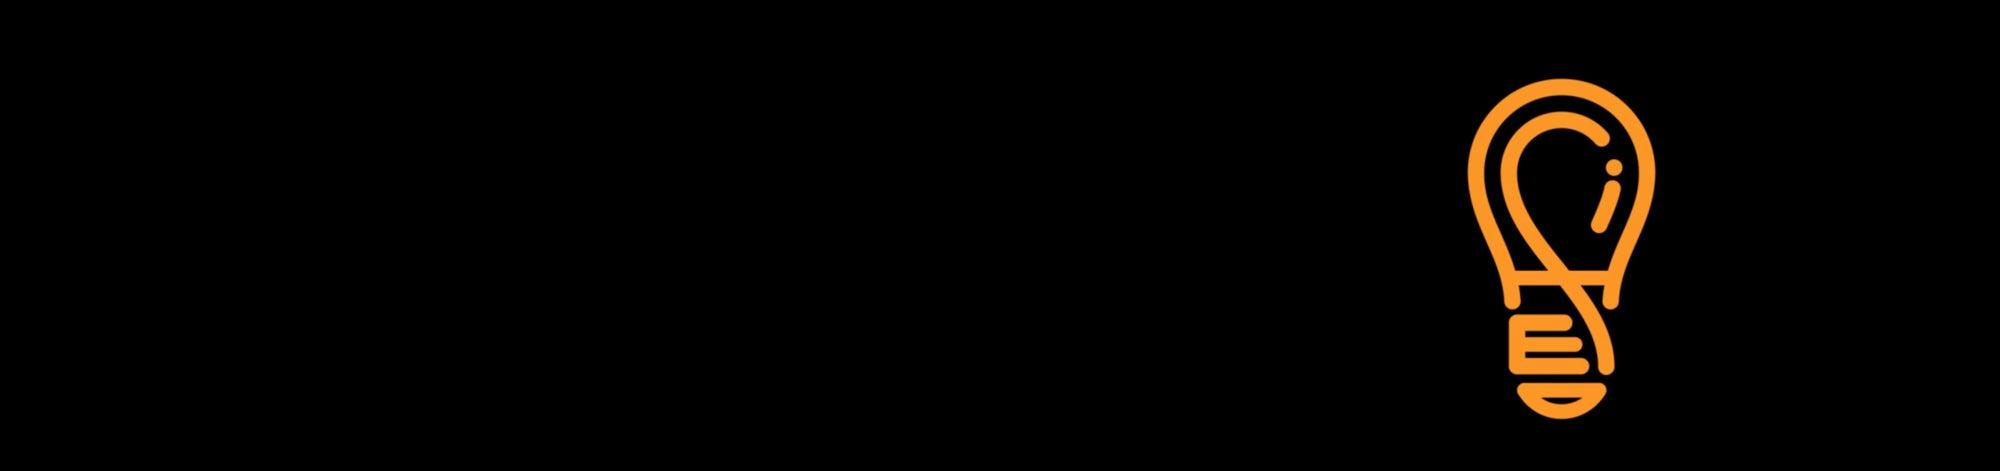 BBC Ideas - a lightbulb graphic on a black background